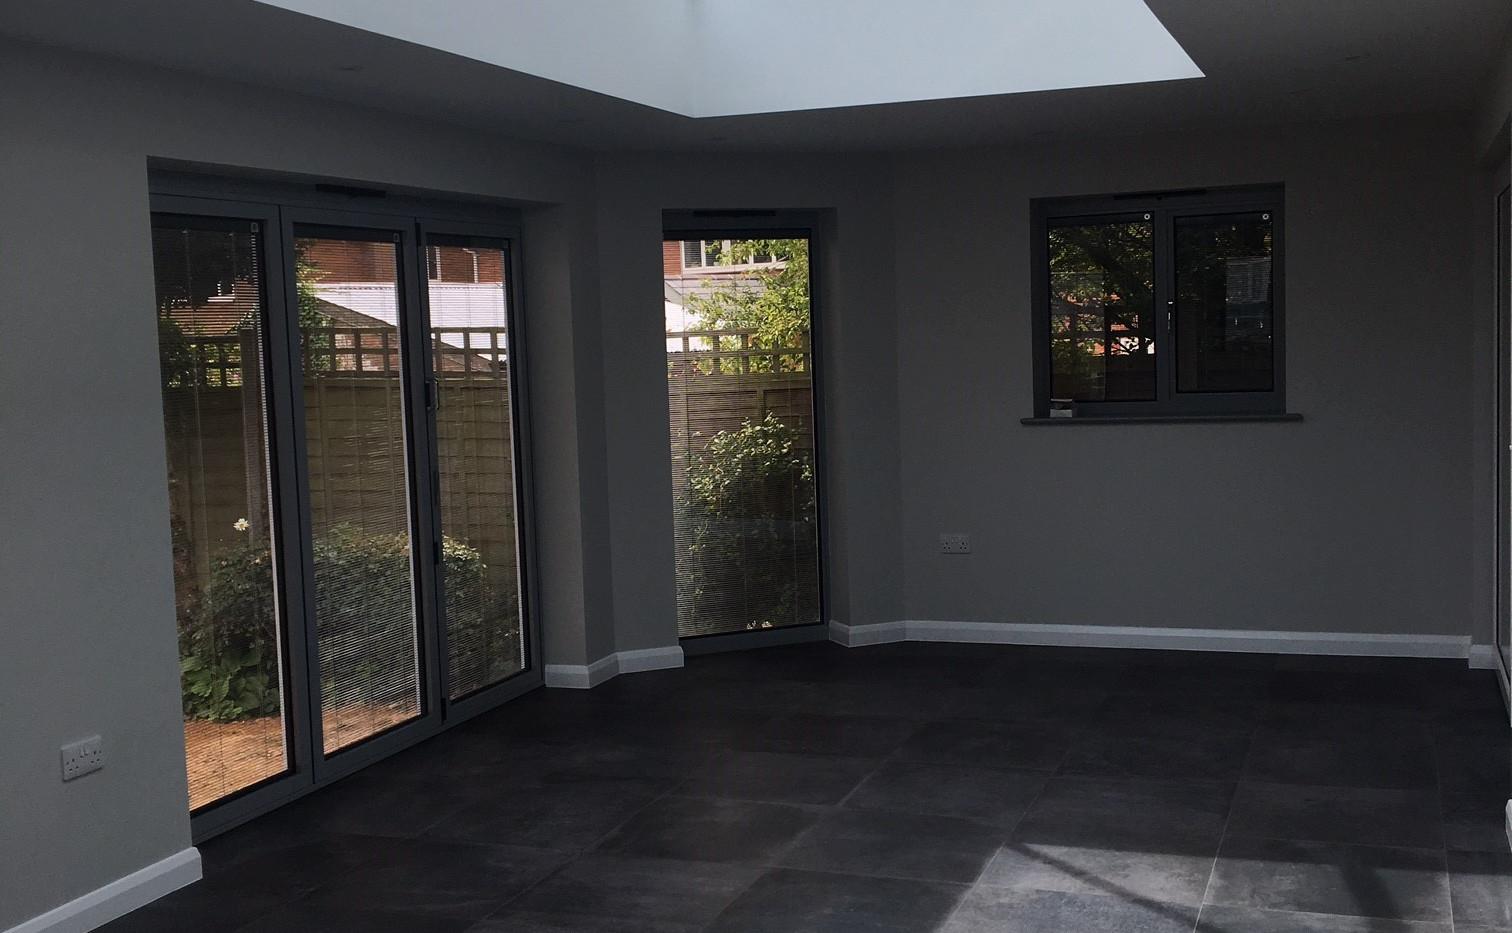 Lantern Roof & Tiled Flooring